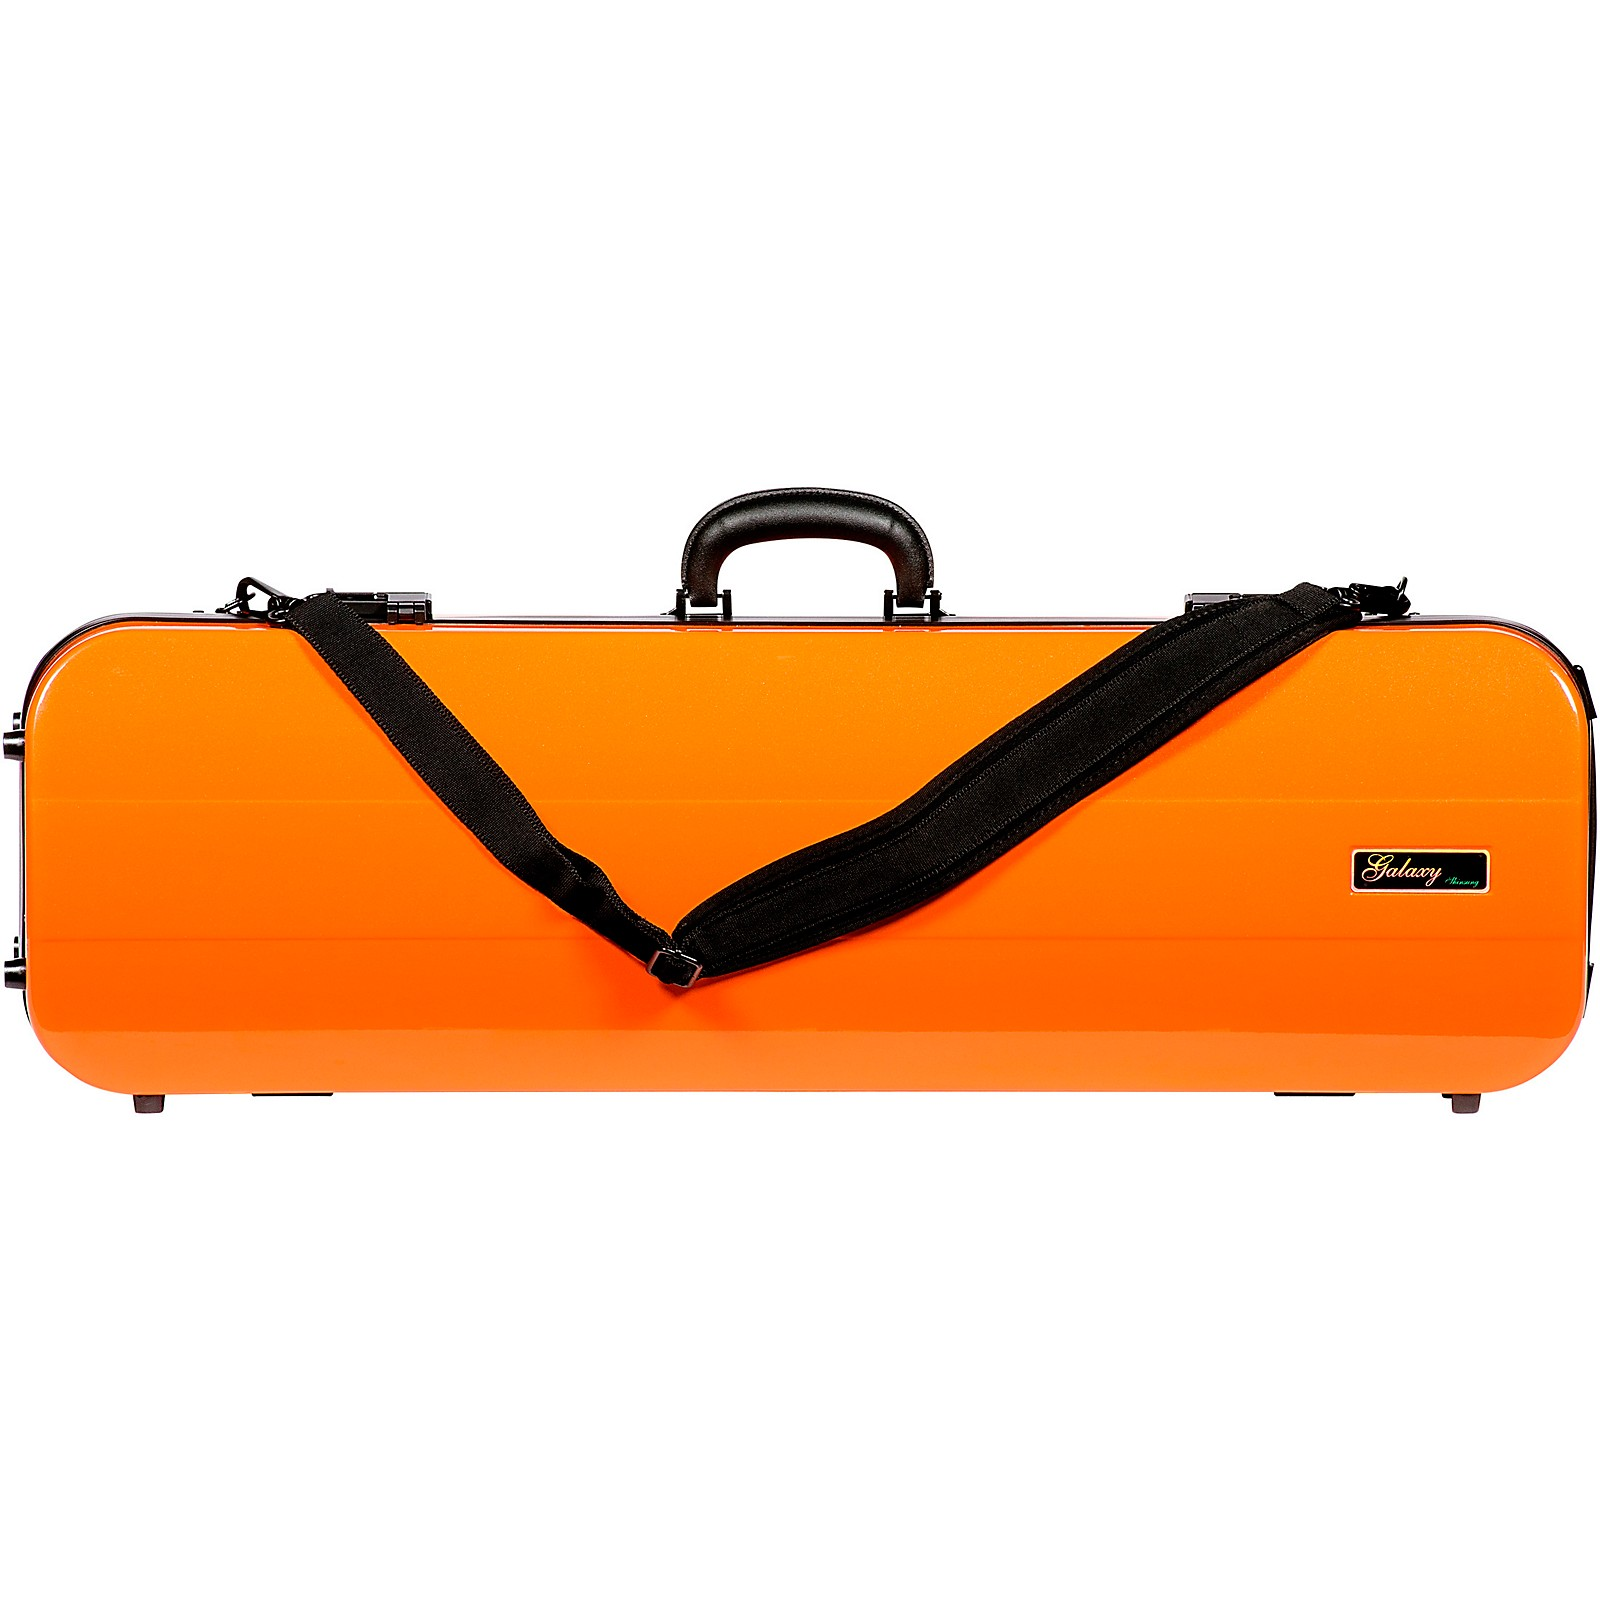 Galaxy Cases Zenith 500SL Series Oblong ABS Violin Case